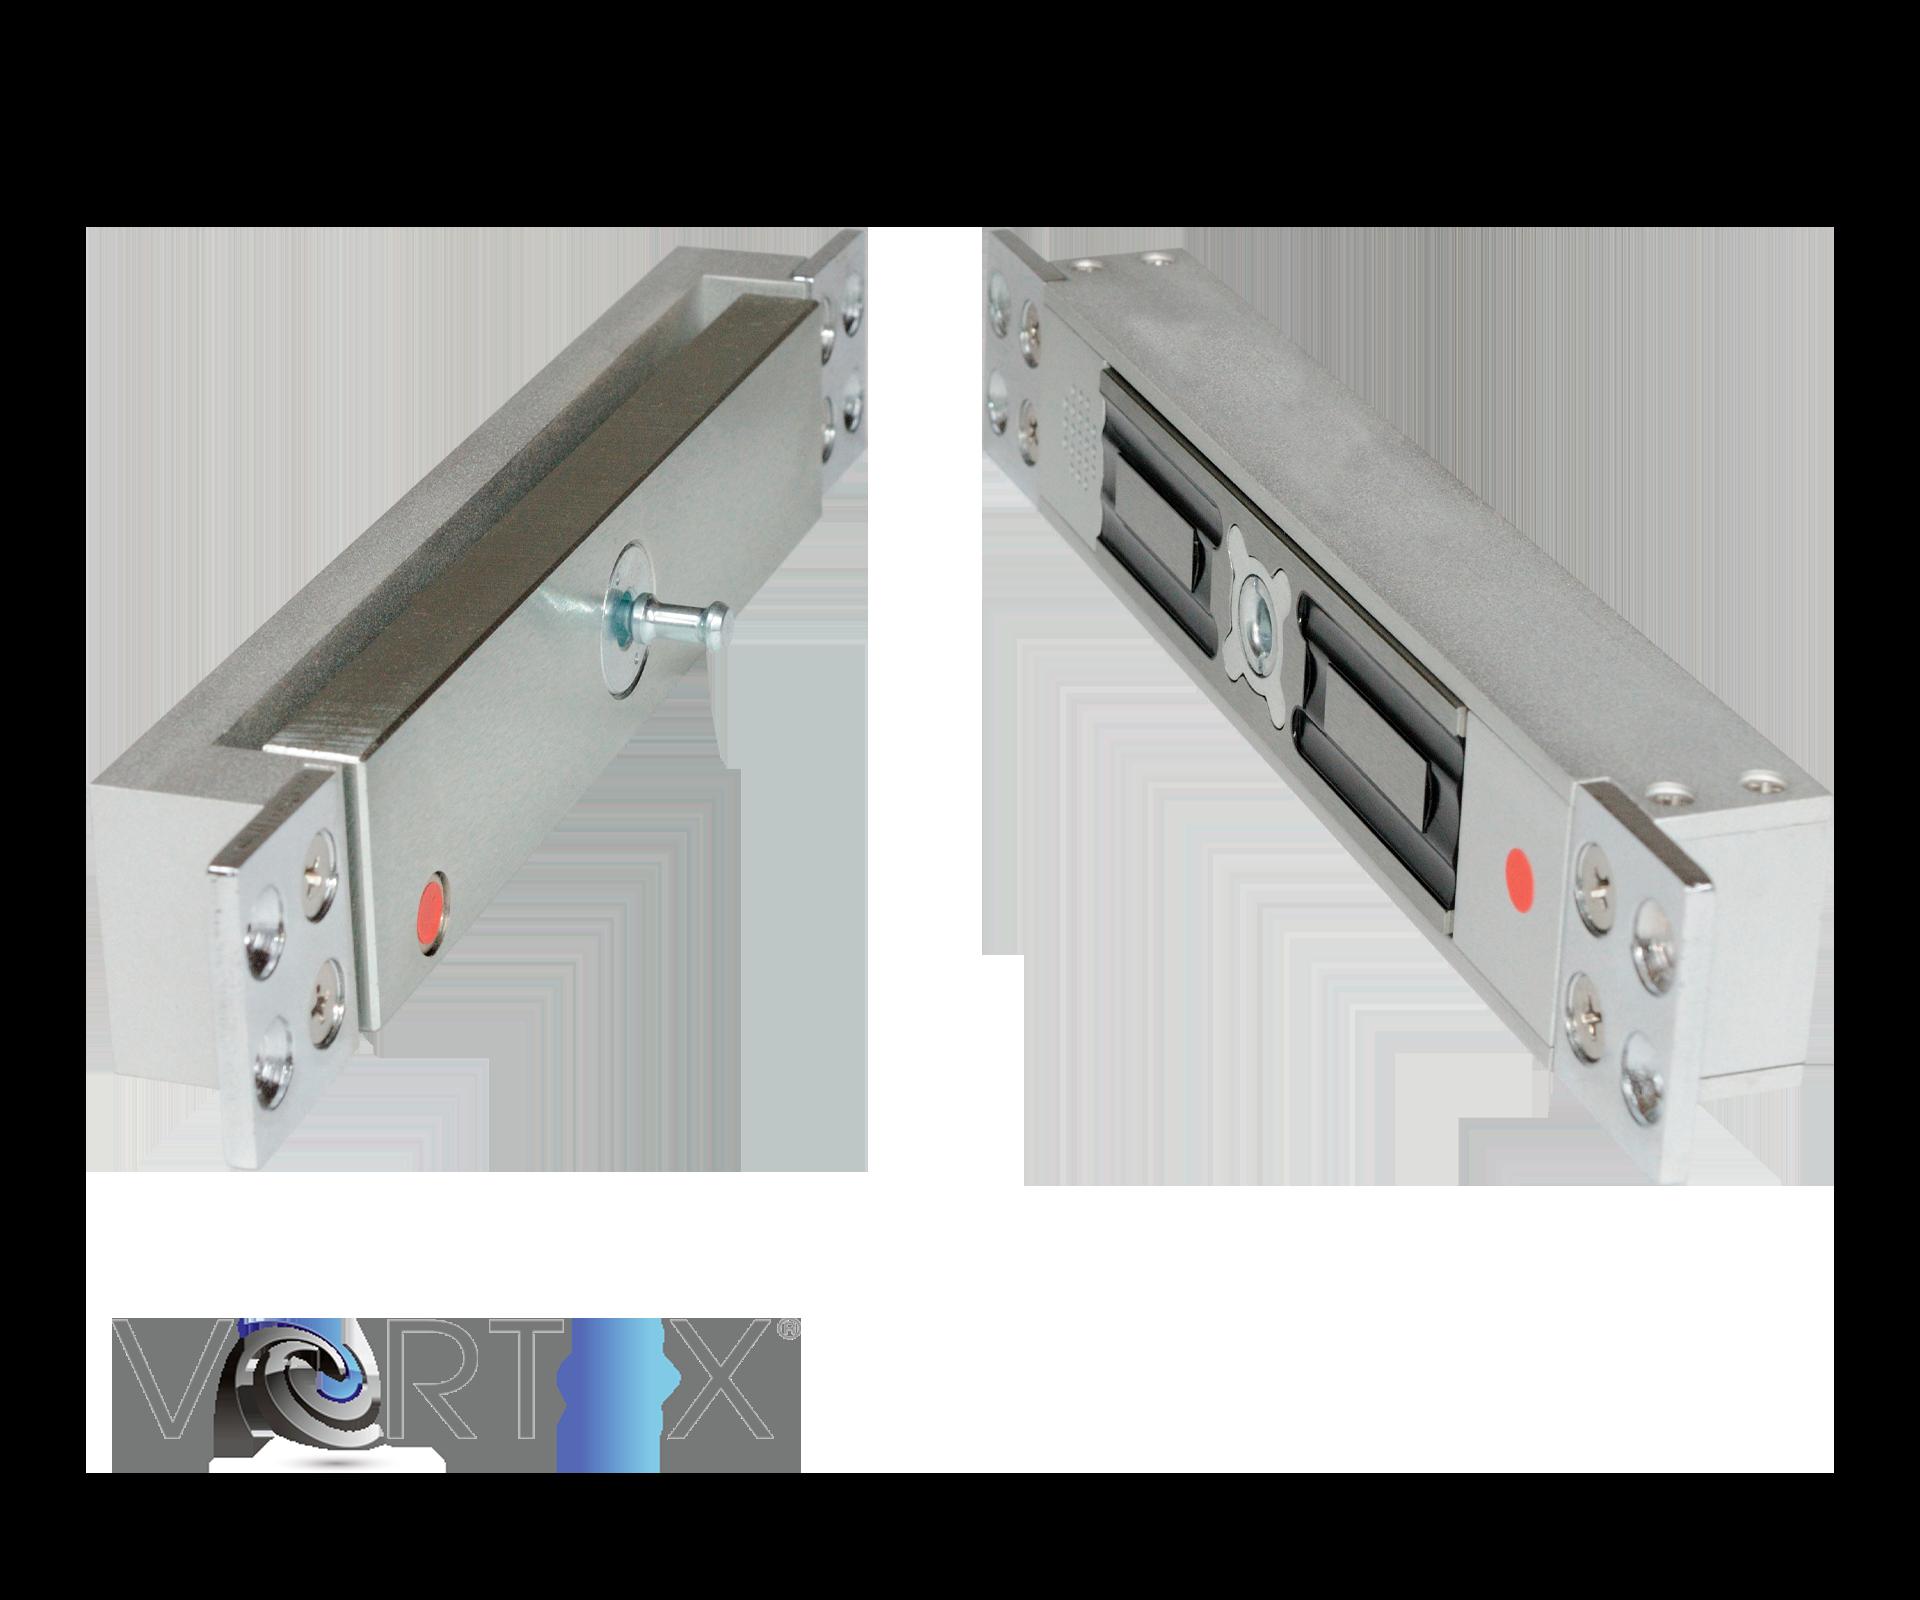 VX1982-35.5